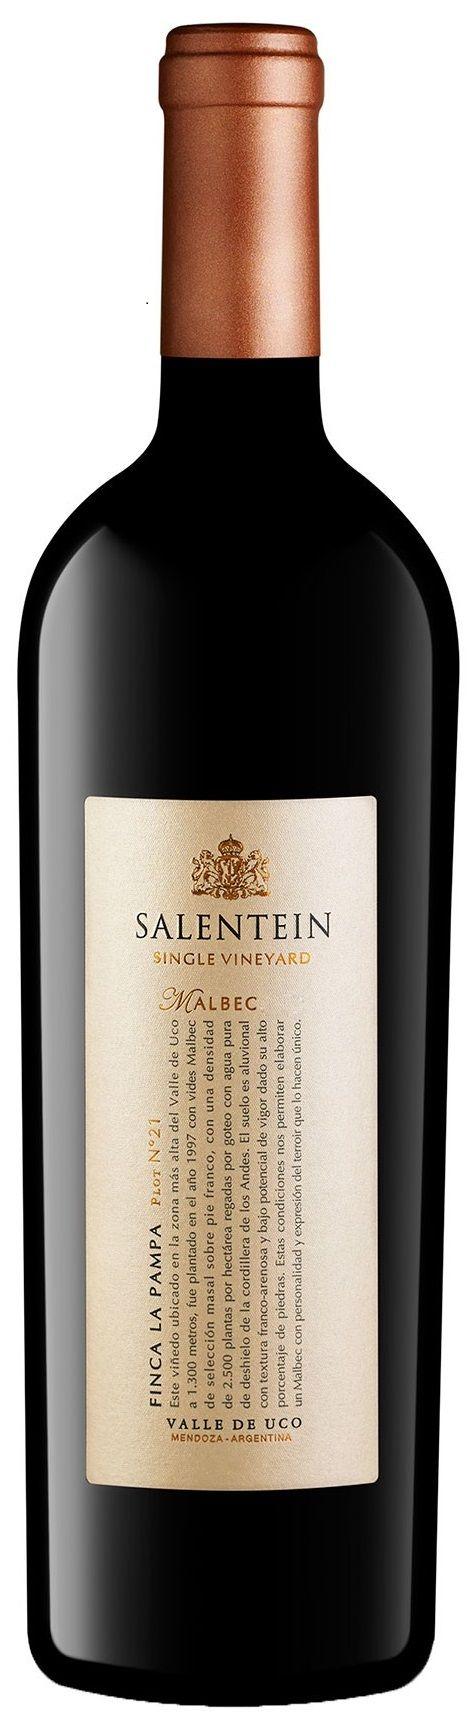 """Salentein Single Vineyard"" Malbec 2010 - Bodega Salentein, Tunuyán, Mendoza---- Terroir: Los Àrboles (Tunuyán)--- Crianza: 16 meses en barricas de roble francés"